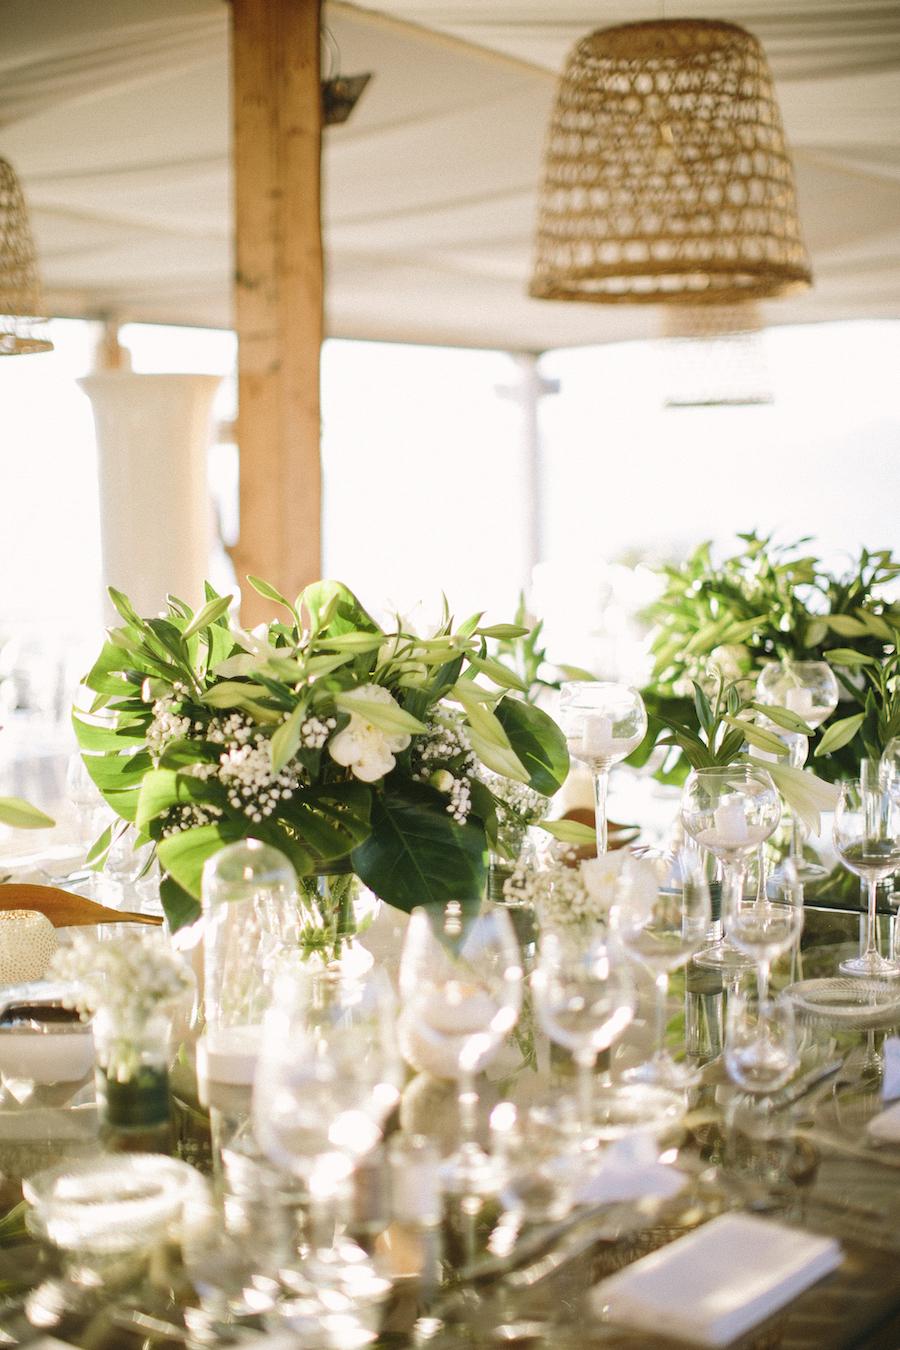 saya-photography-wedding-mariage-corse-corsica142.jpg